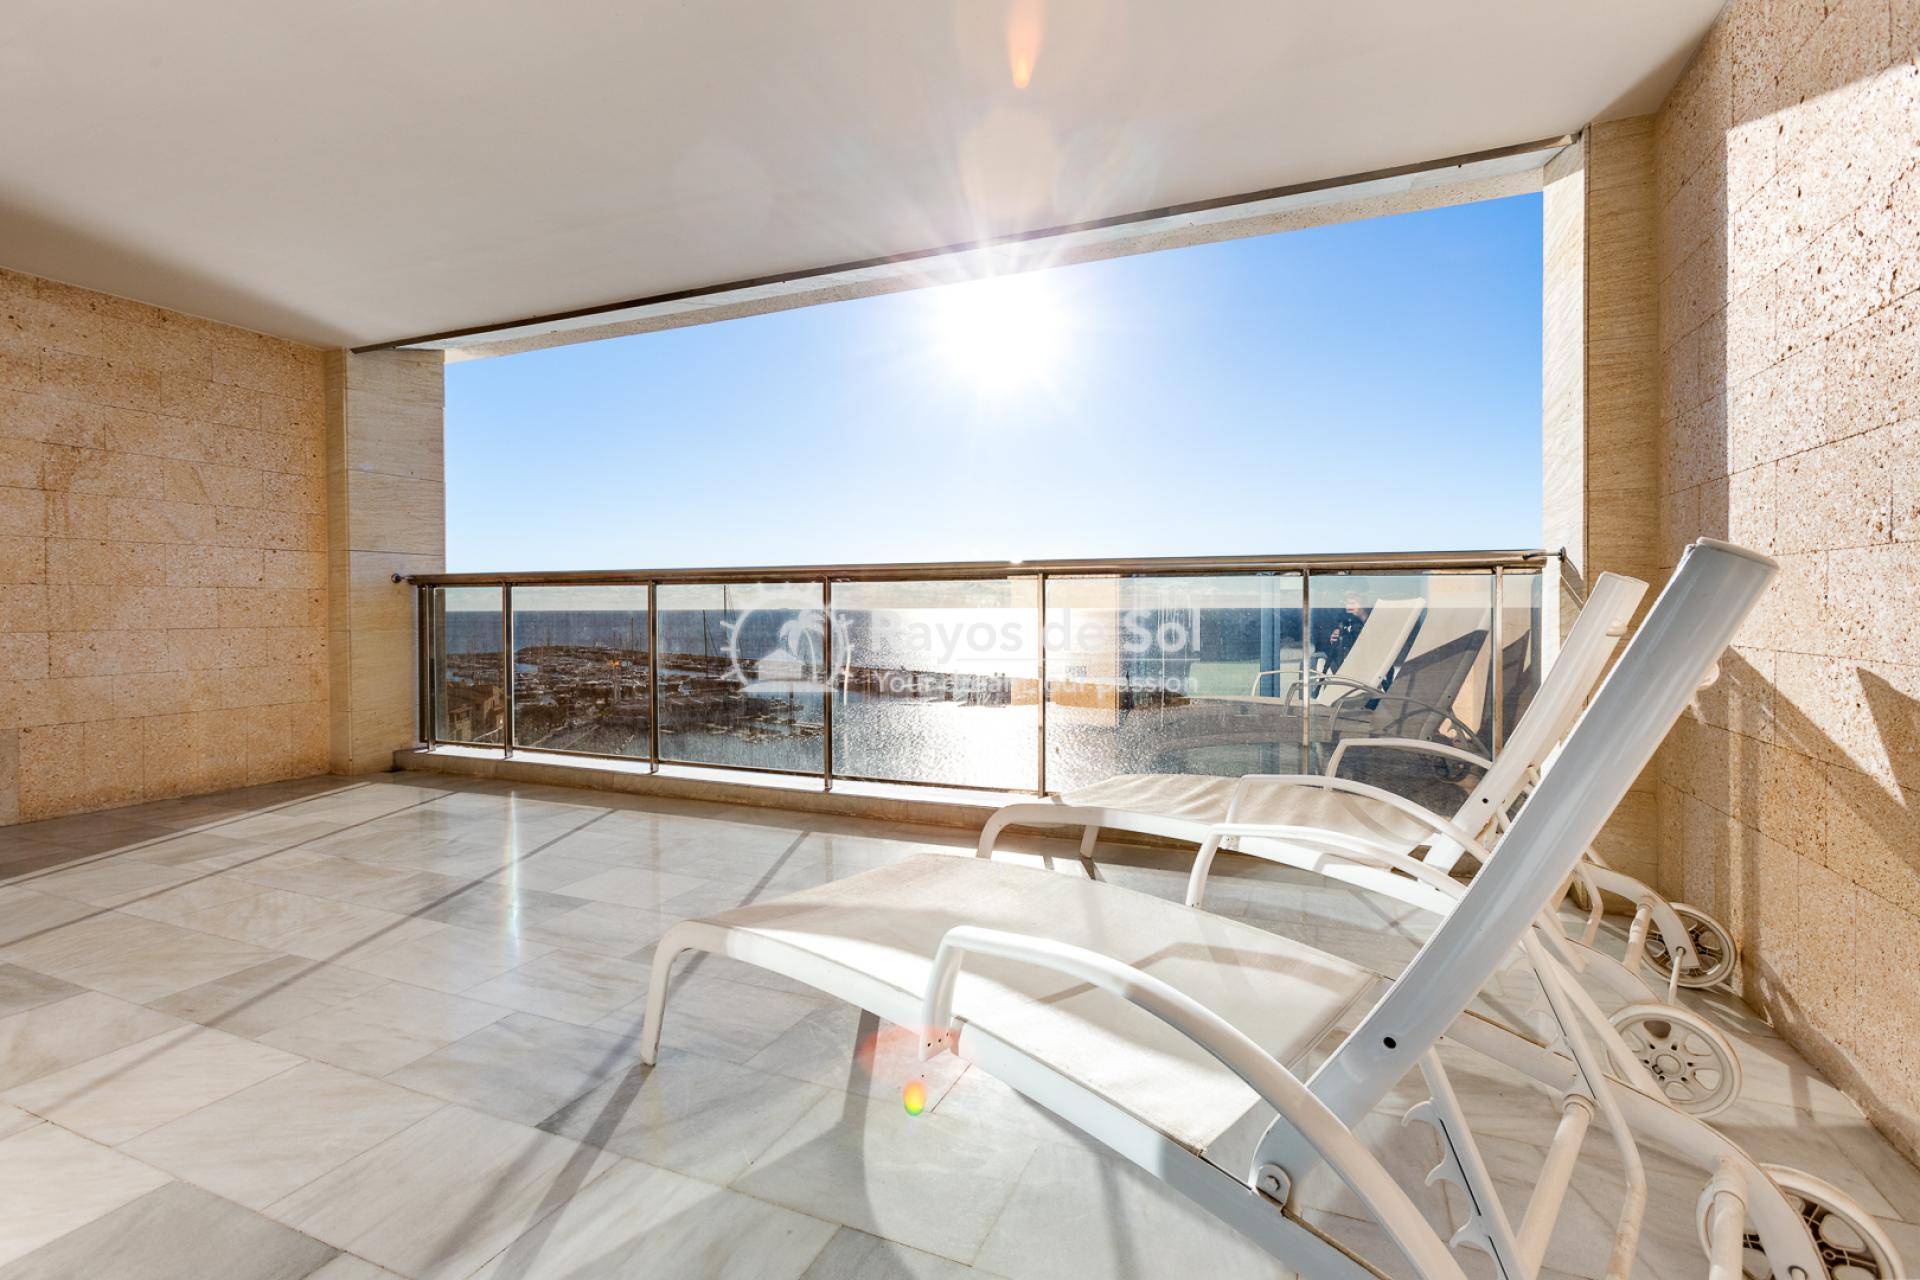 Turnekey first line apartments  in Altea, Costa Blanca (Alteabeach) - 3